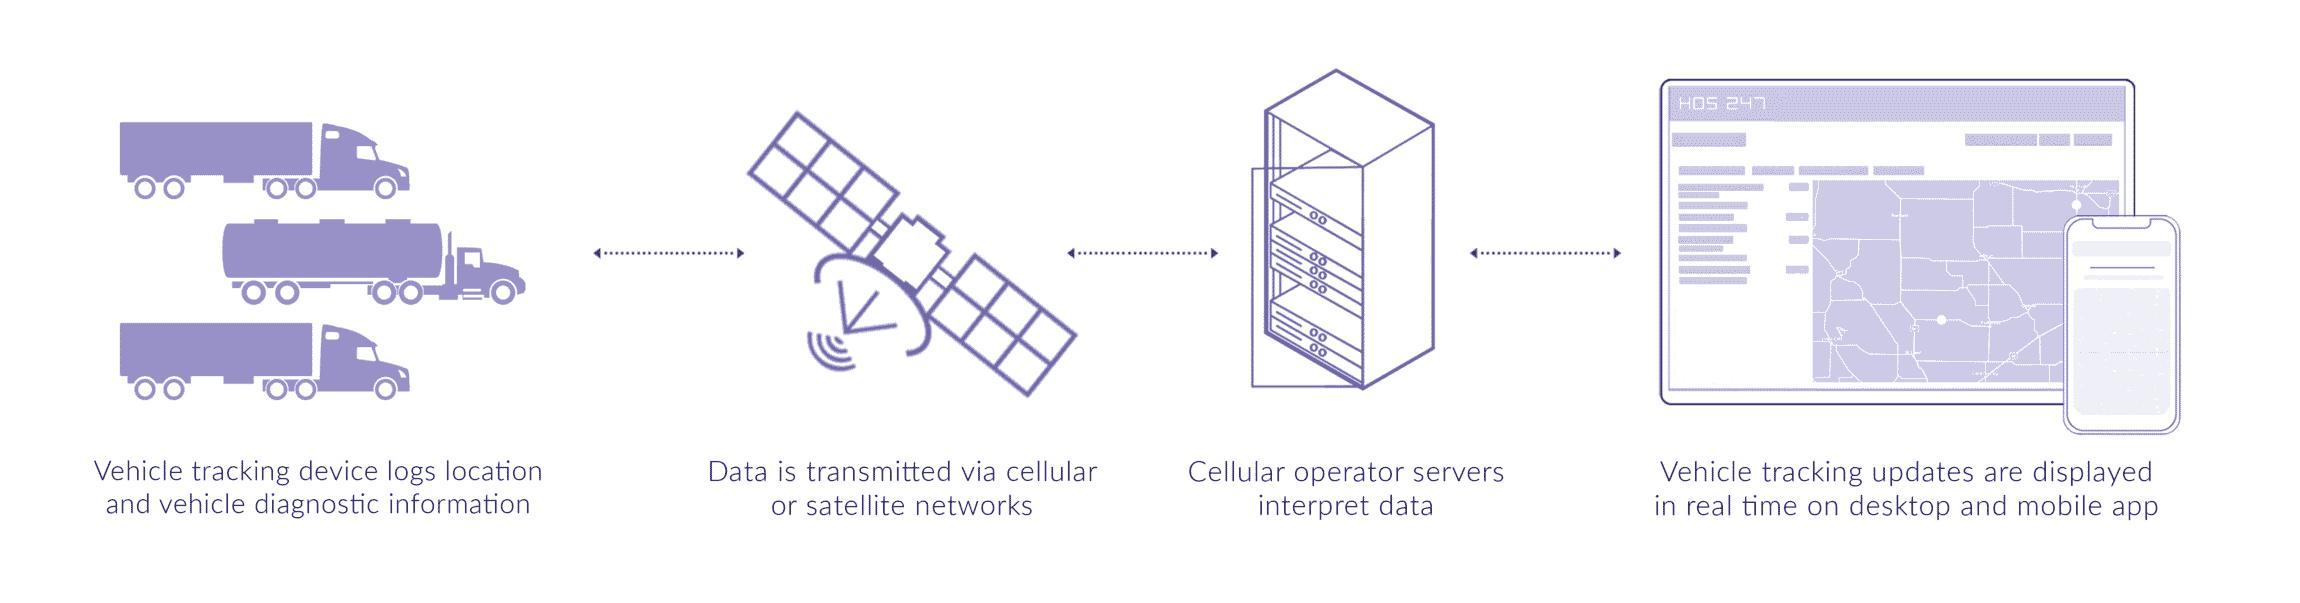 HOS247 gps tracker connection scheme